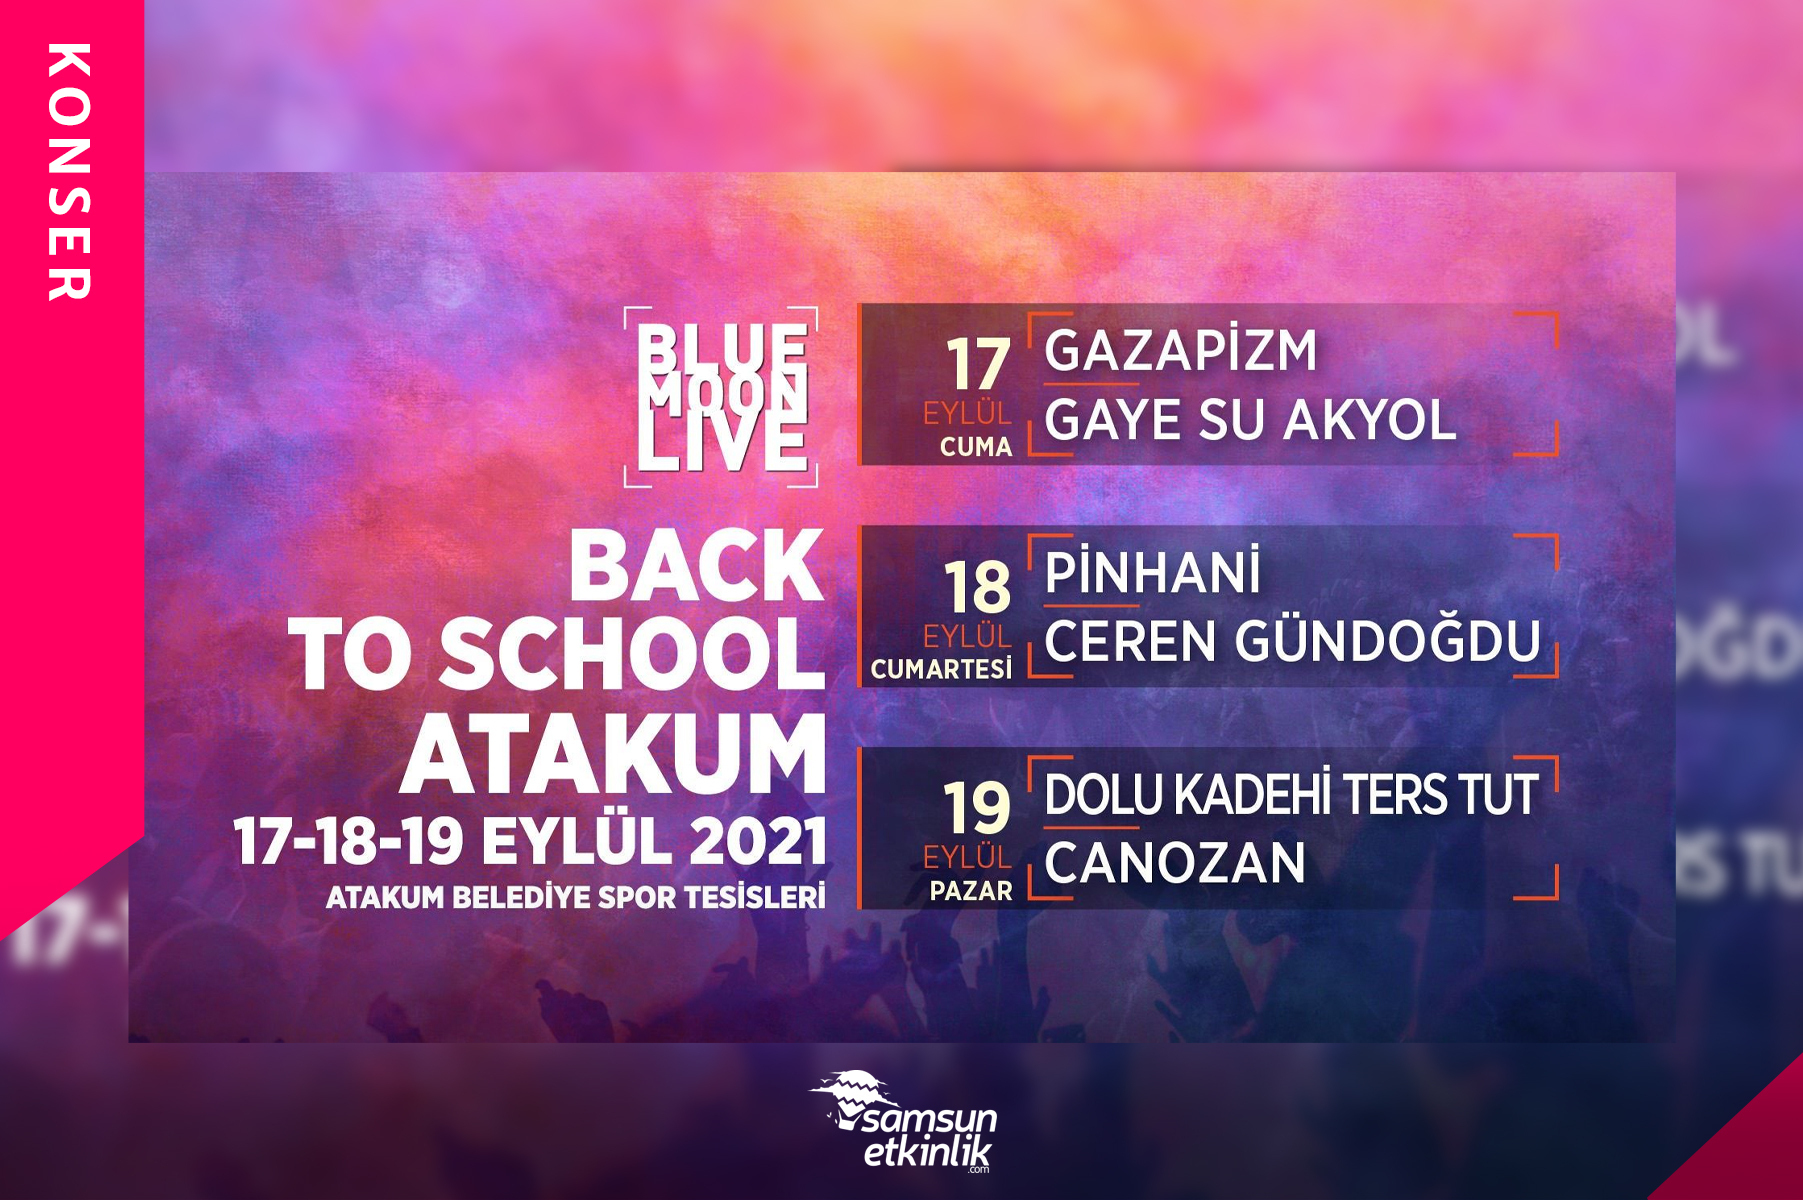 Bluemoonlive Back to School Fest Atakum 2021